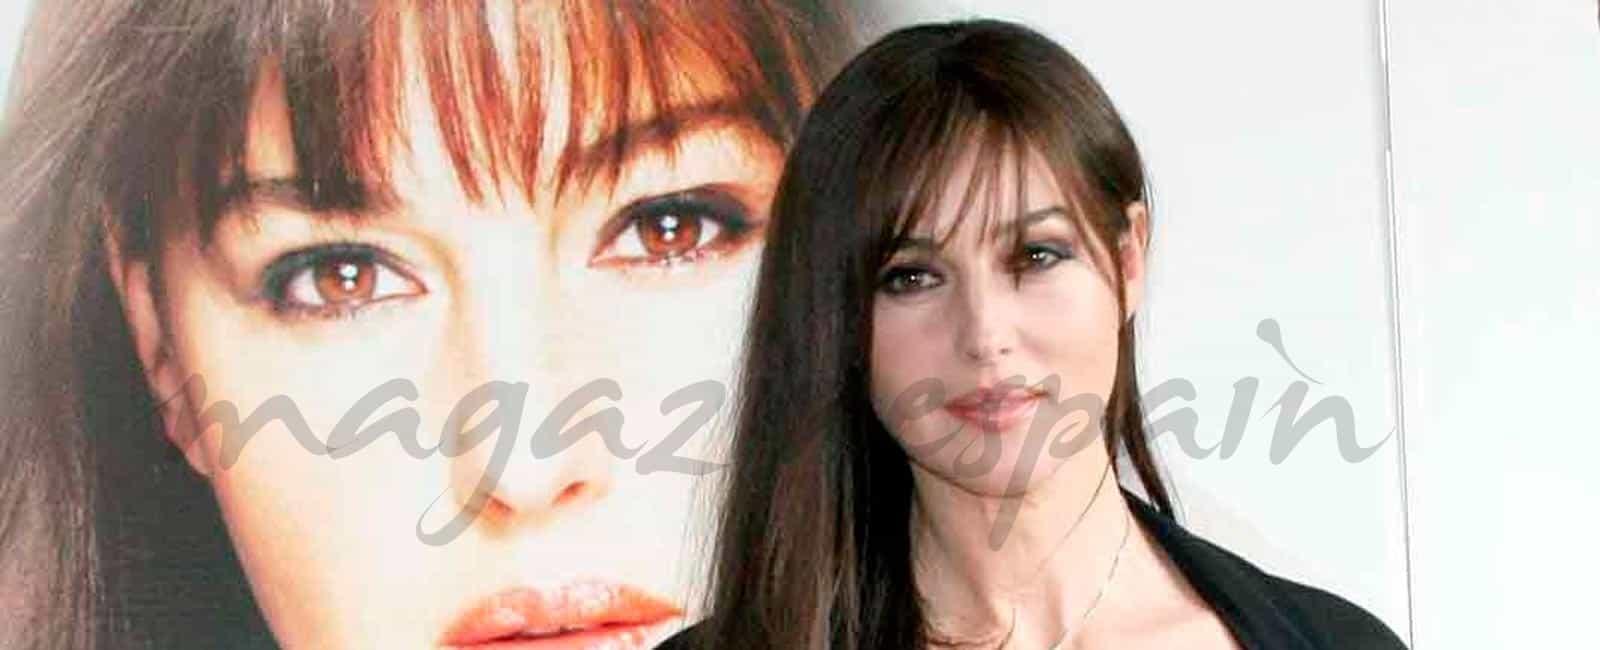 Así eran, Así son: Mónica Bellucci 2006-2016